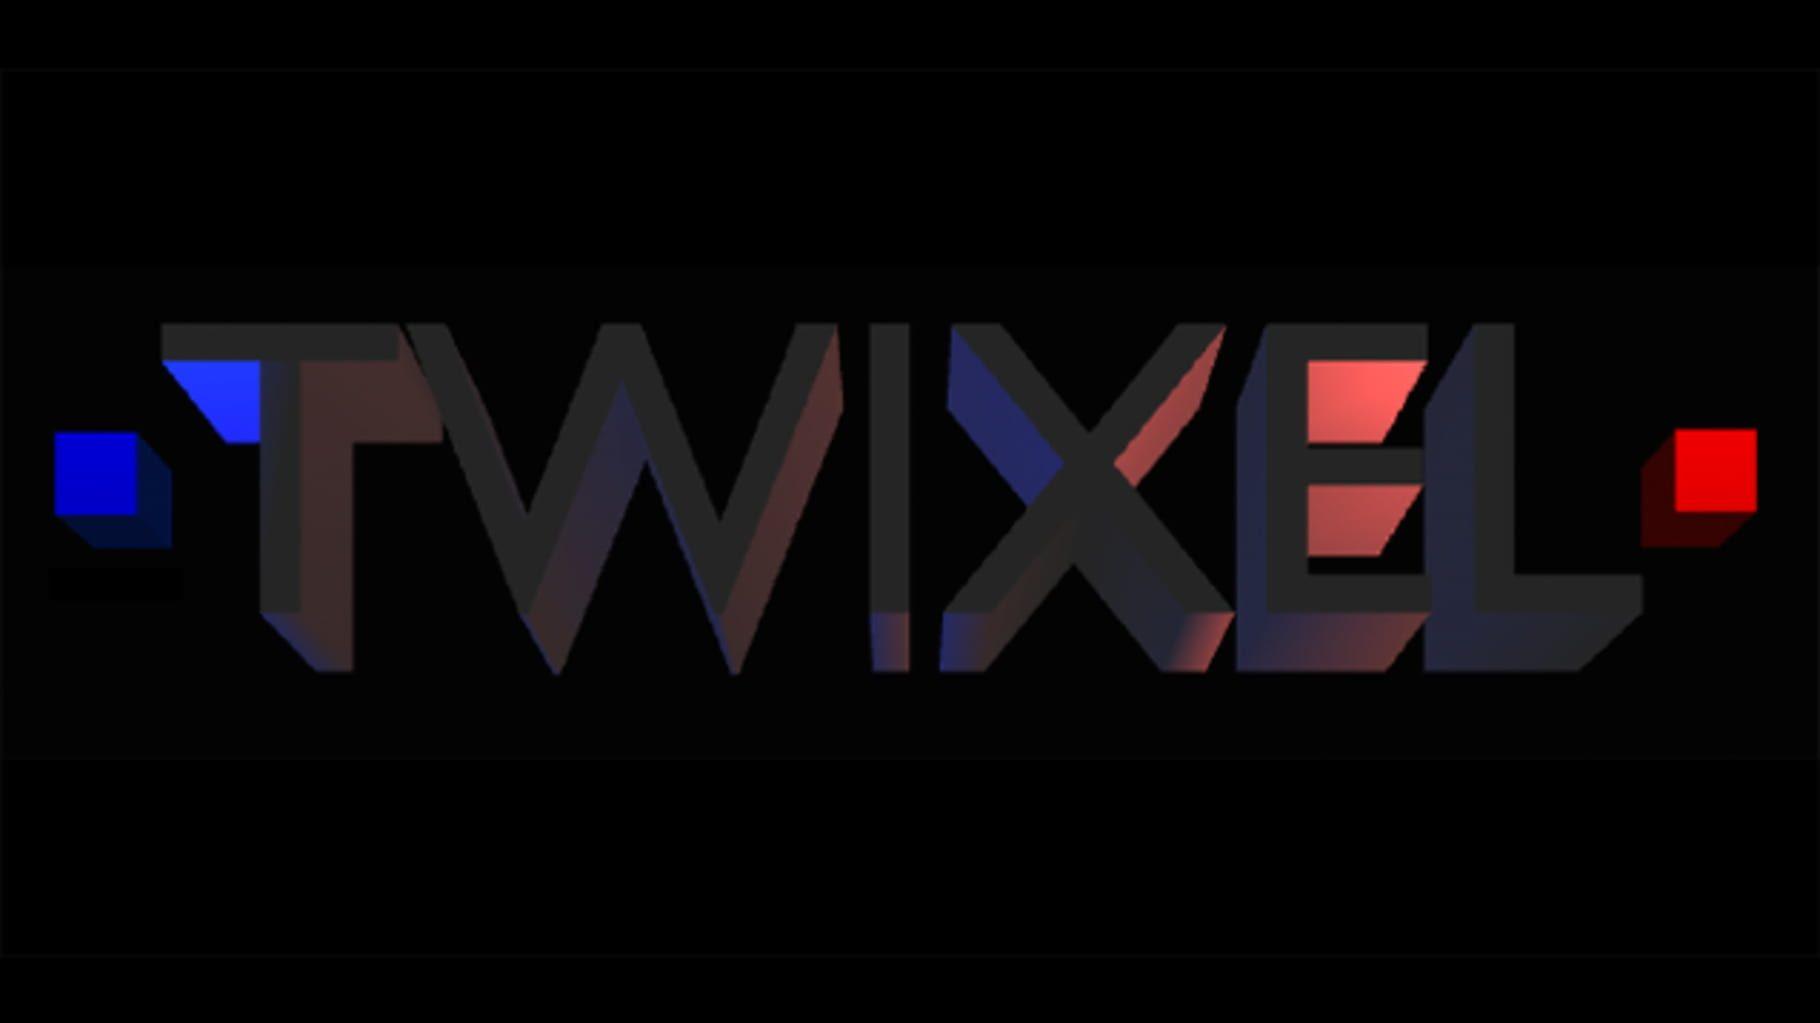 buy Twixel cd key for all platform